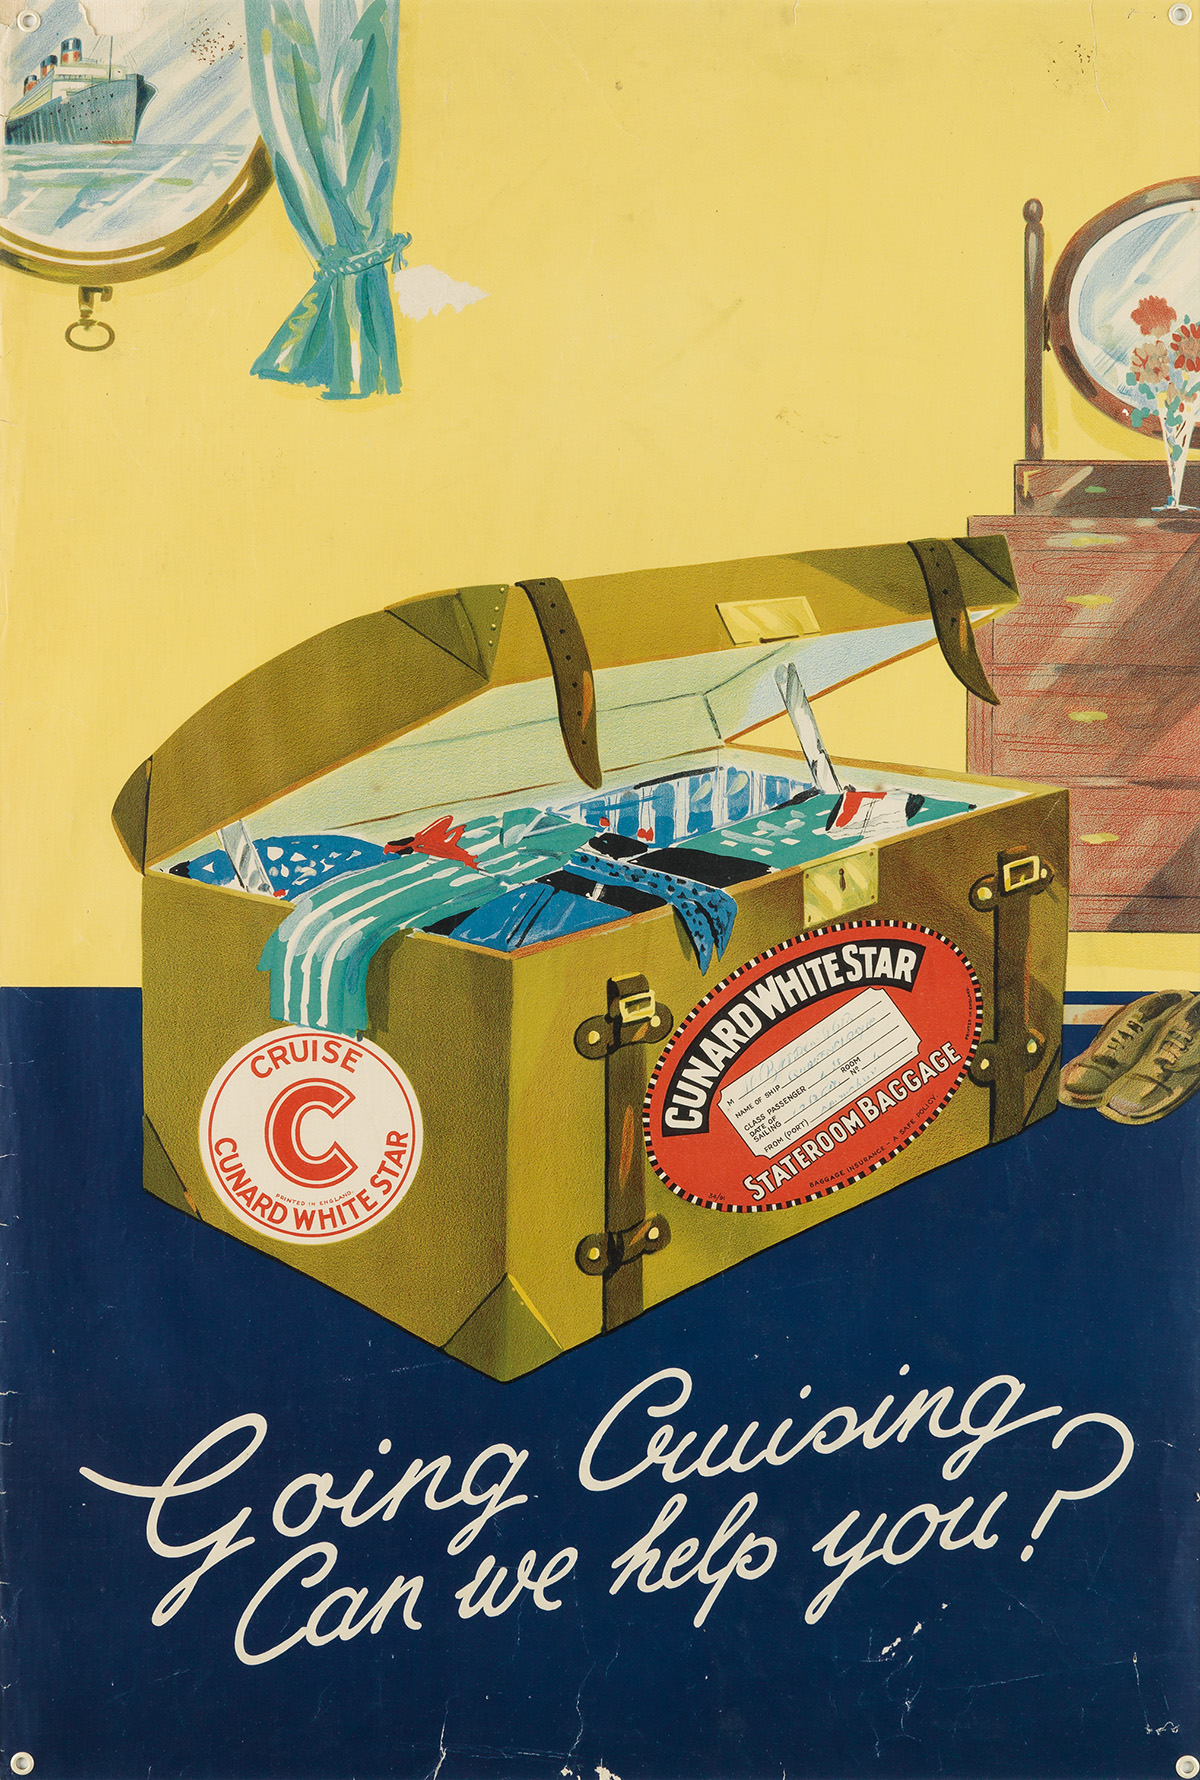 DESIGNER-UNKNOWN-GOING-CRUISING--CAN-WE-HELP-YOU--CUNARD-Cir